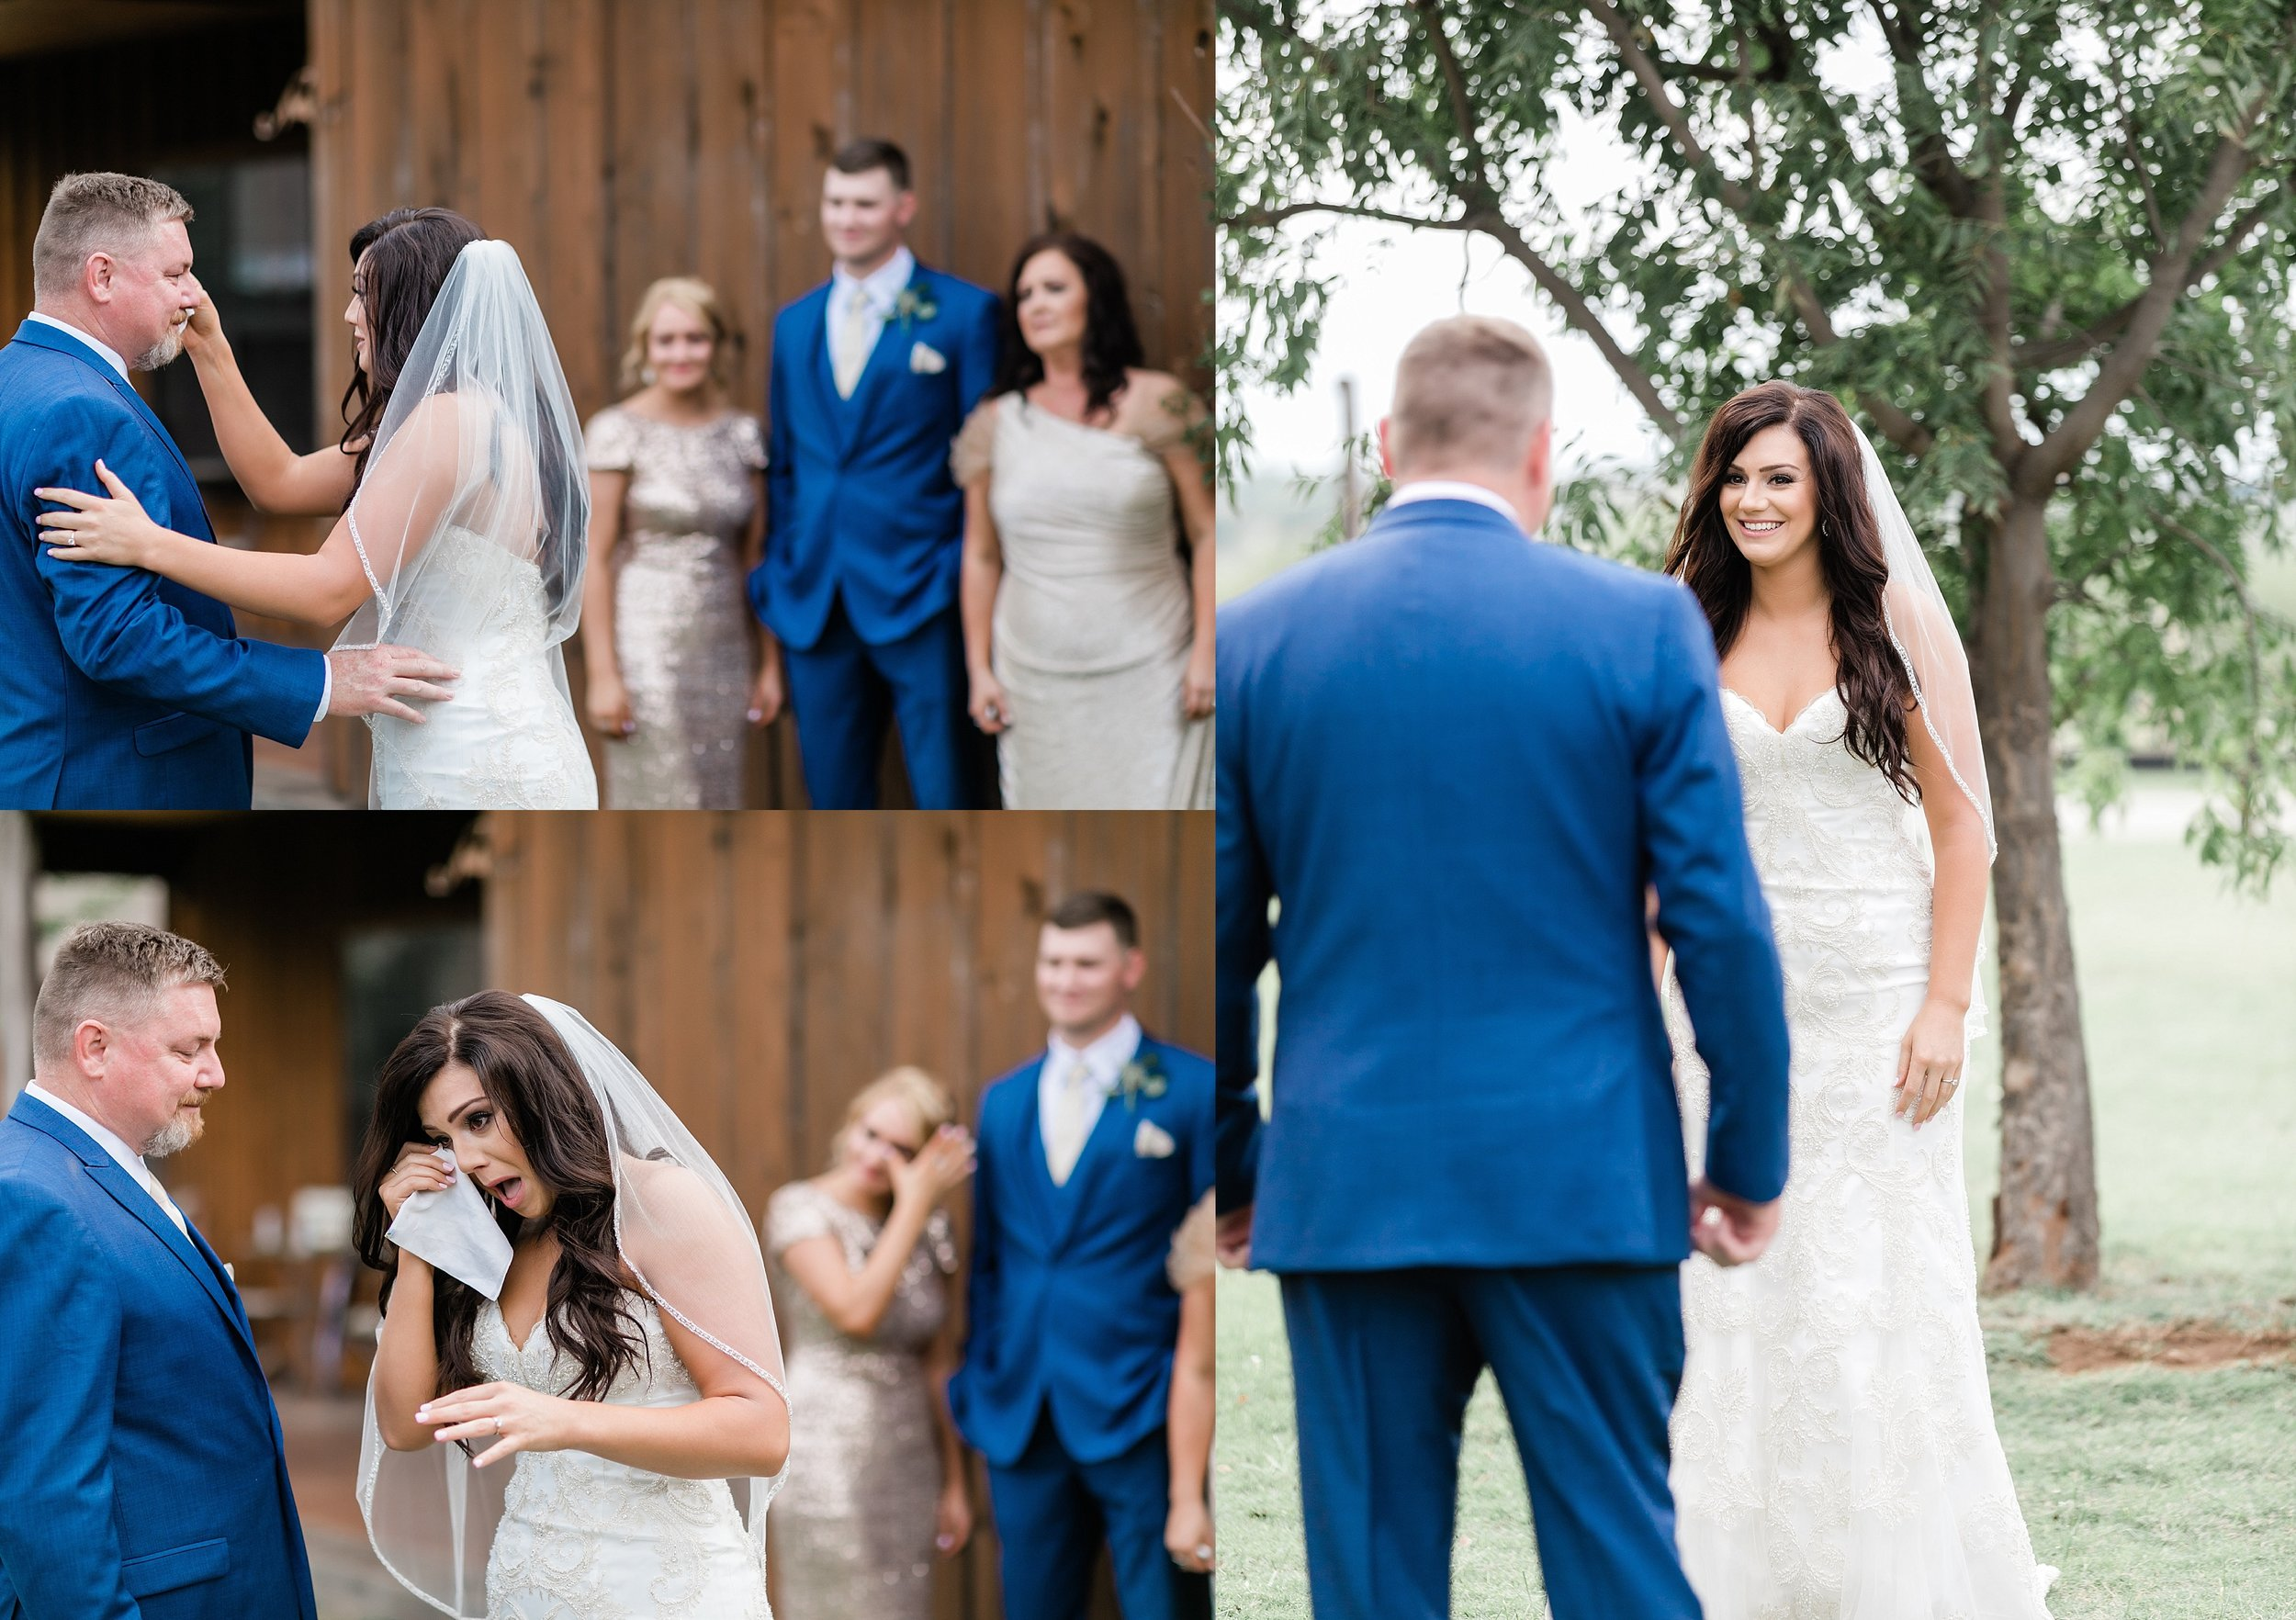 bailey-and-carl-coyote-ranch-resort-wedding-photographer-wichita-falls-texas-destination-wedding-0007.jpg